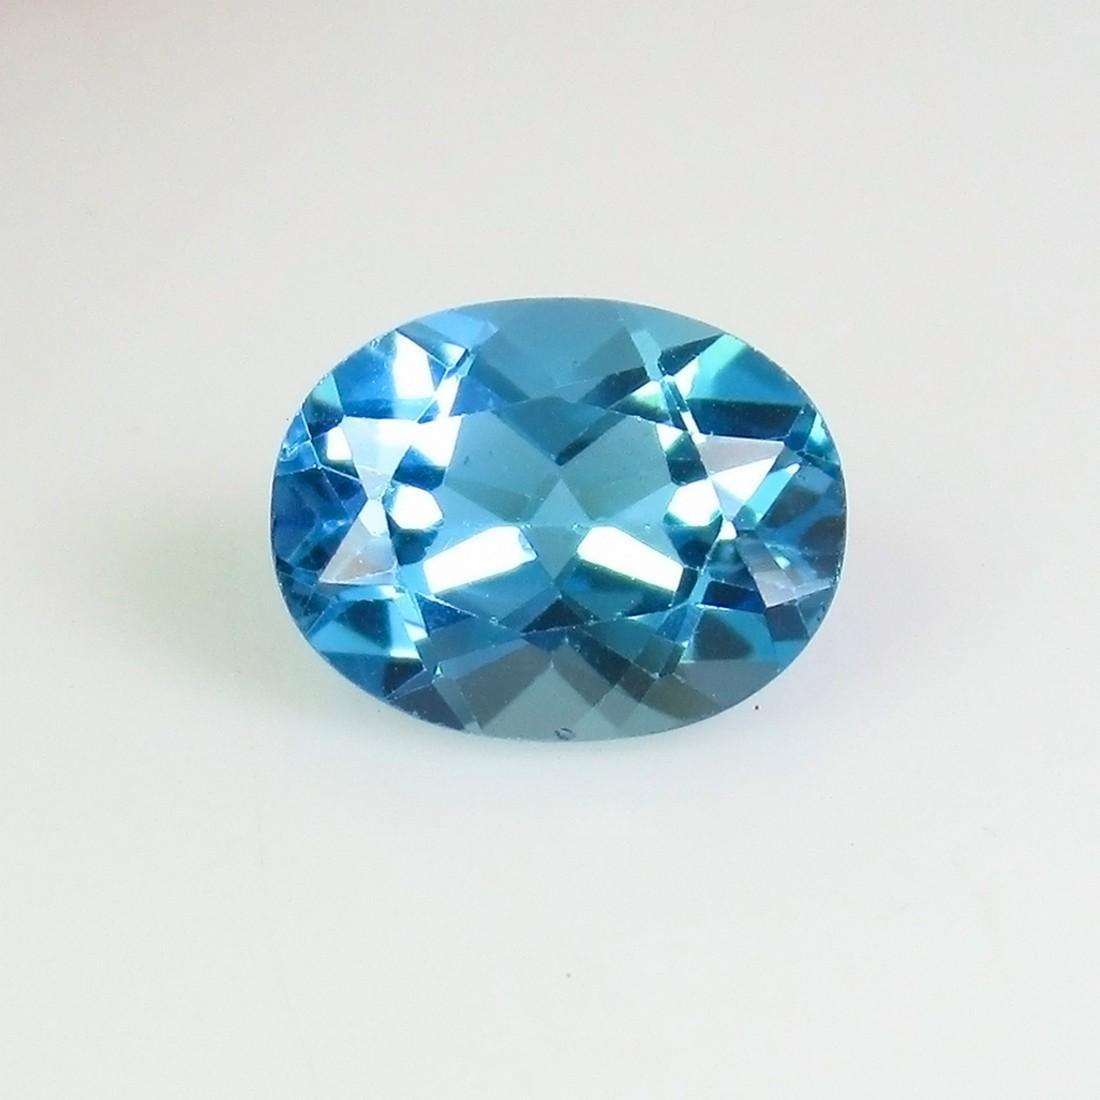 2.26 Ct Genuine Brazil Blue Topaz 9X7 mm Oval Cut